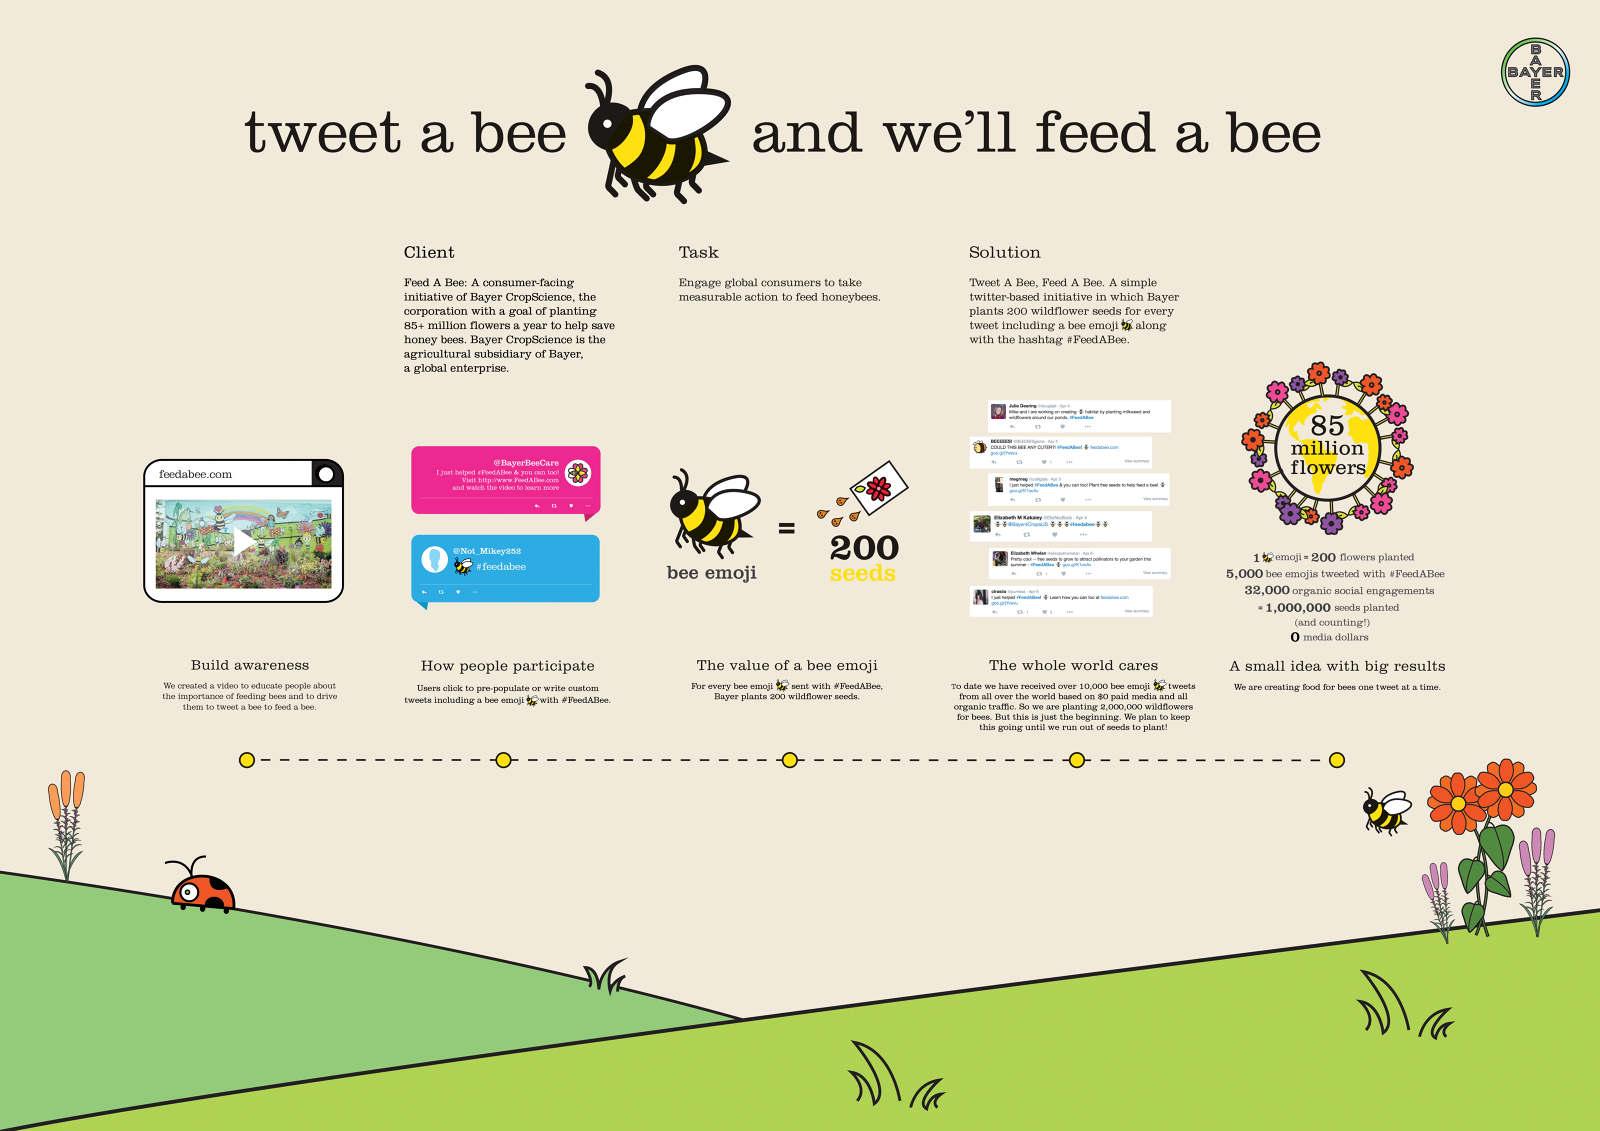 TWEET A BEE - Rhea Hanges